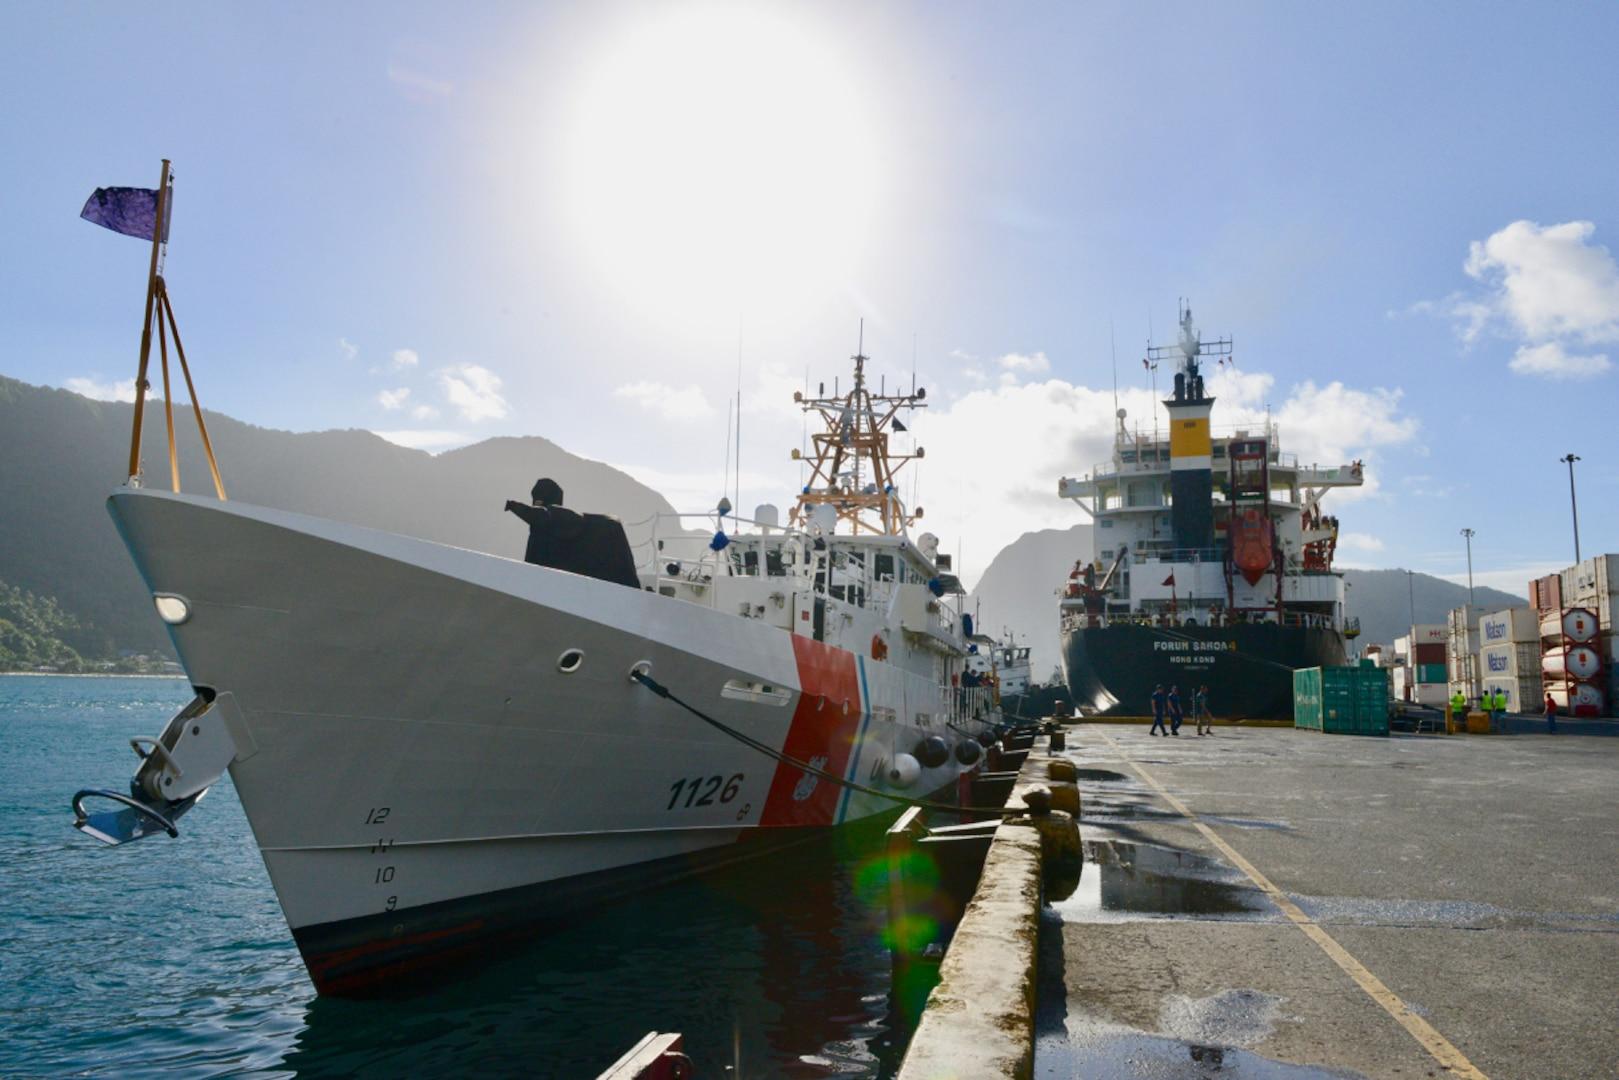 USCGC Joseph Gerczak (WPC 1126) Arrives in American Samoa on Patrol